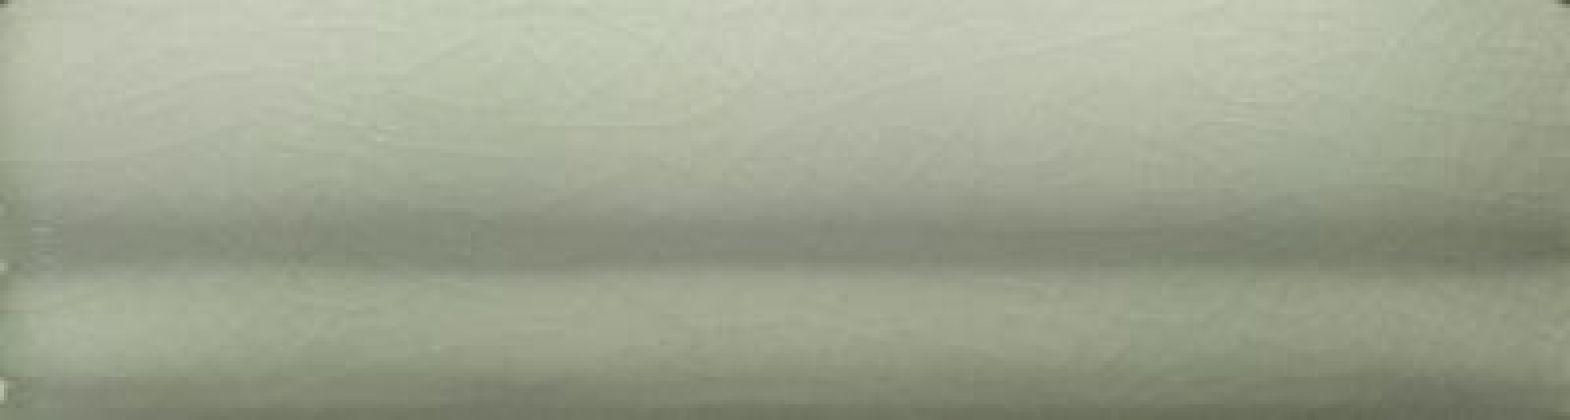 Moldura Greencrack 5x15